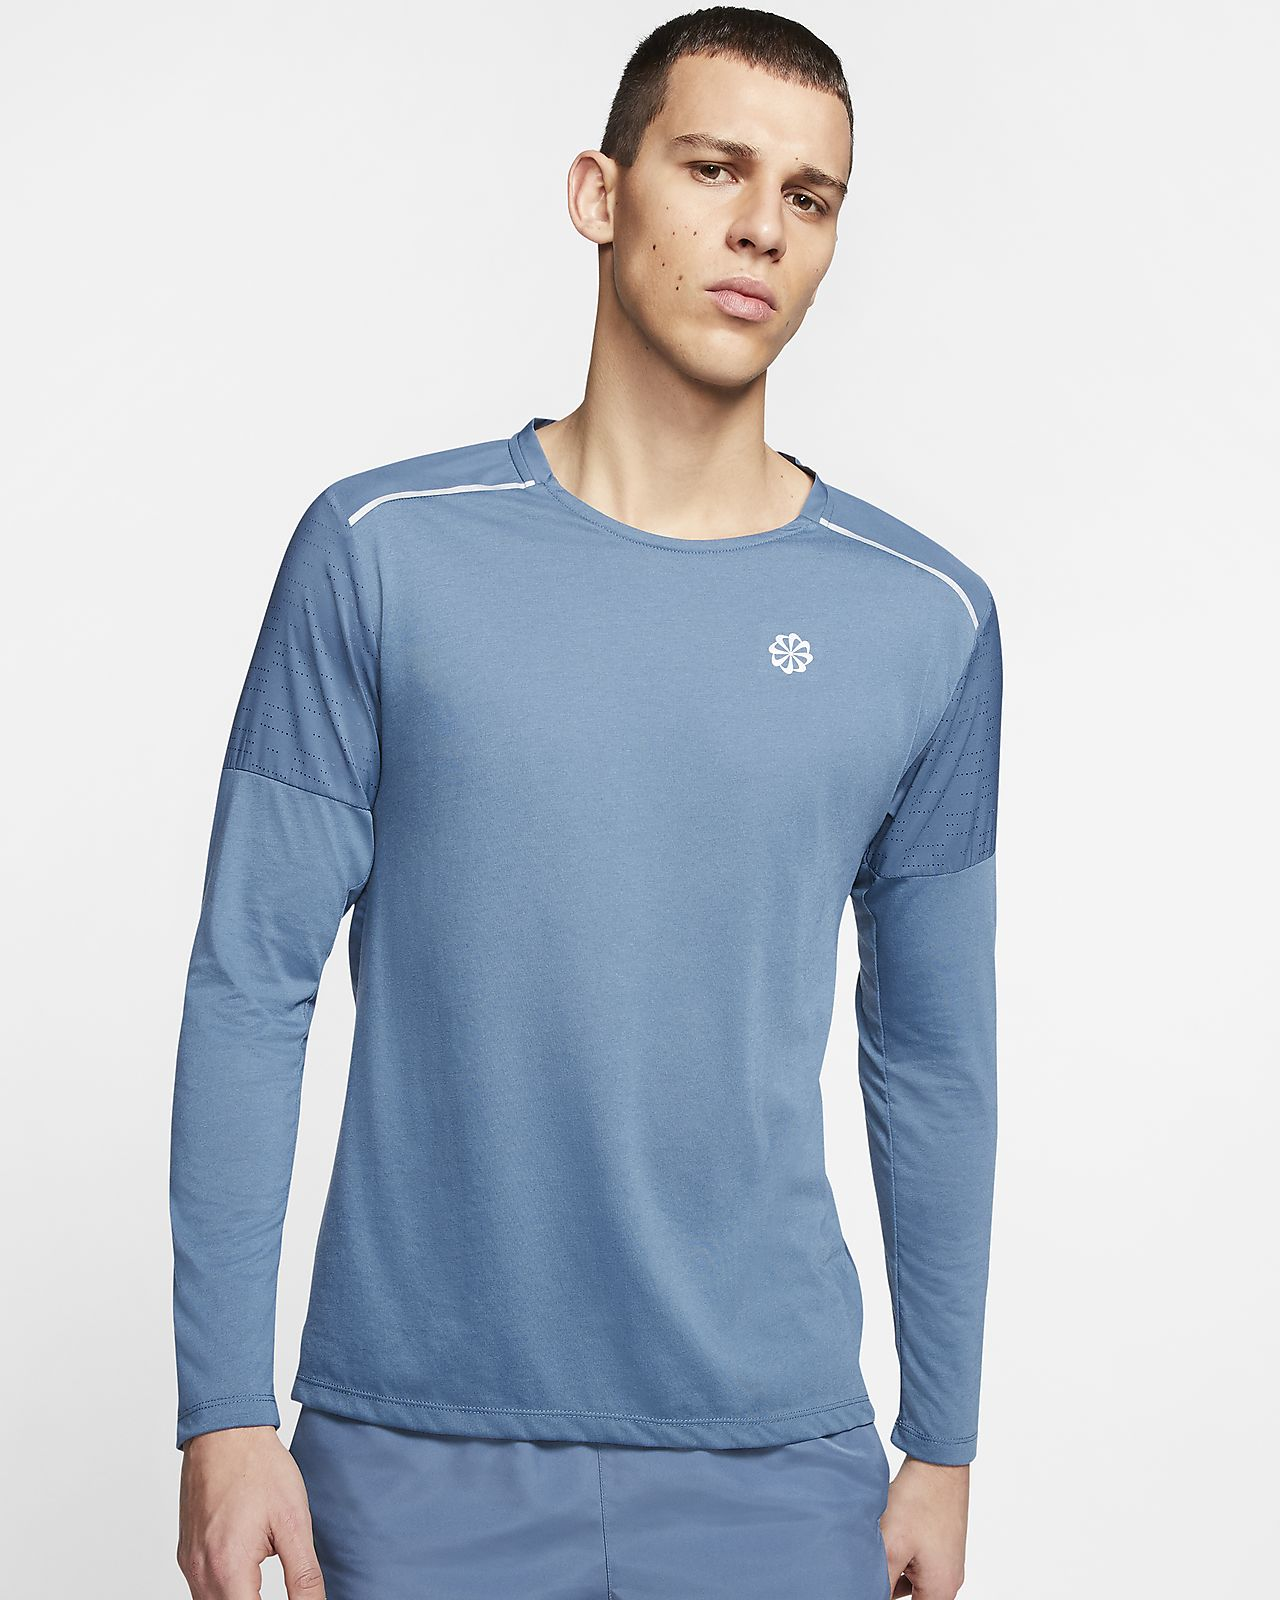 Nike Rise 365 Men's Long Sleeve Running Top